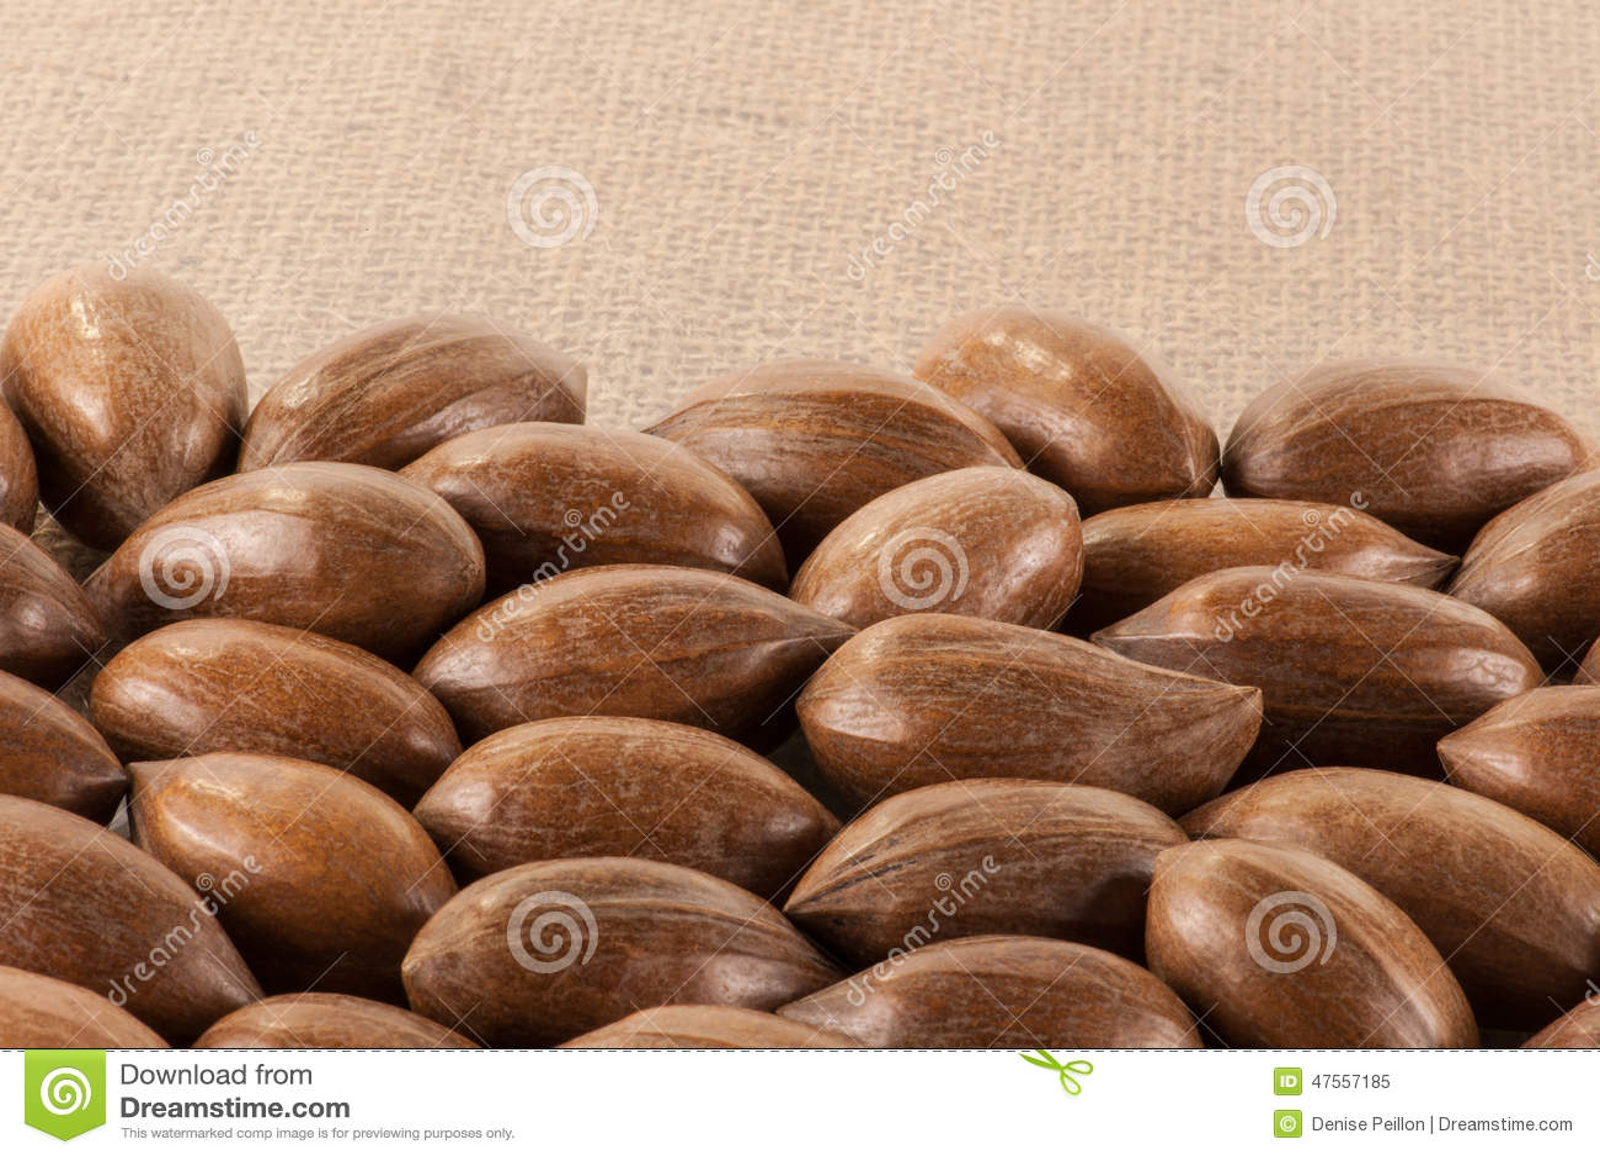 Close up of pecan nuts